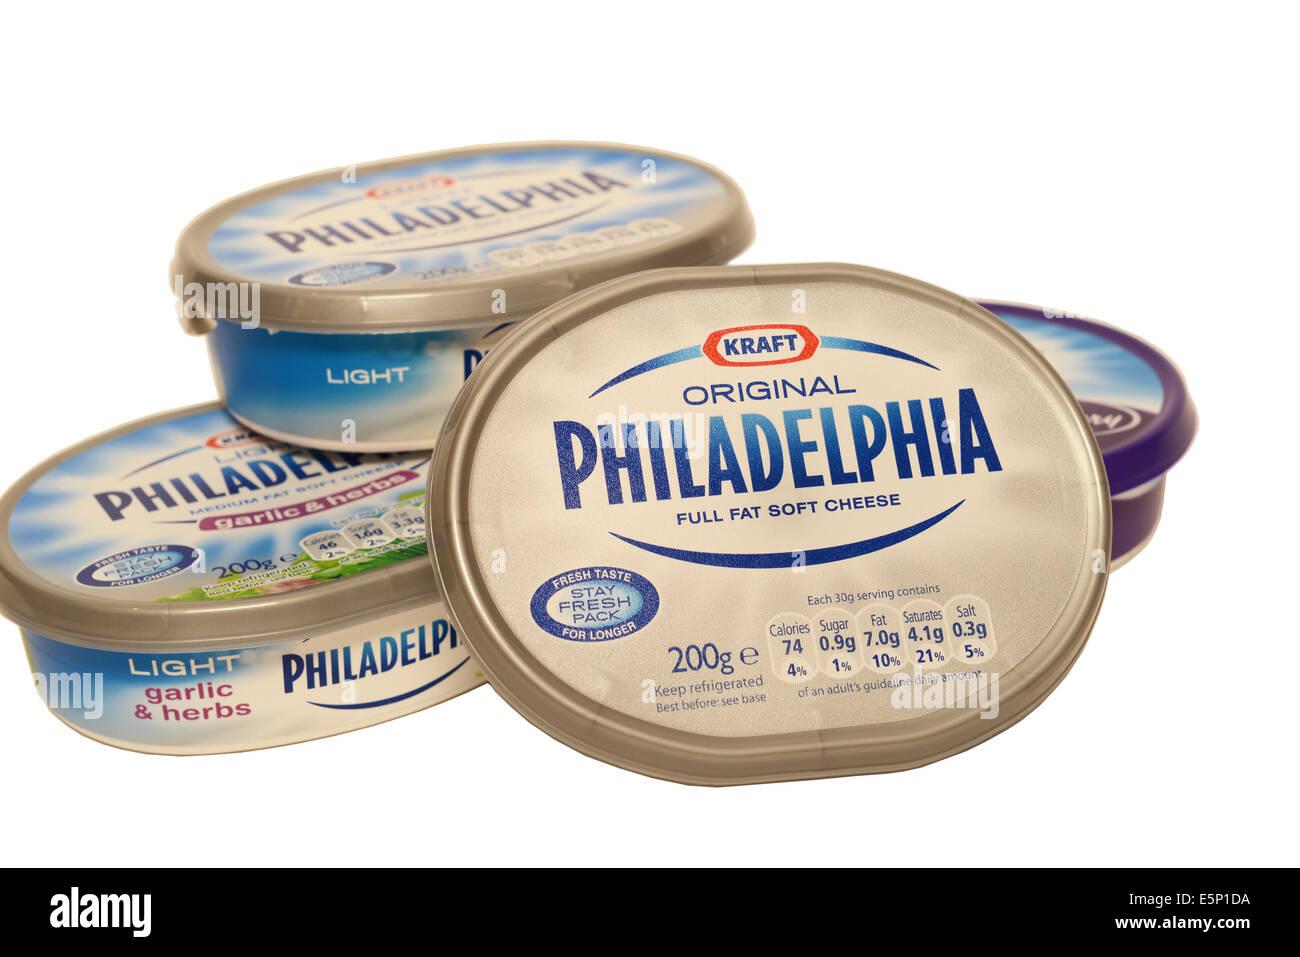 Philadelphia Soft Cheese Range - Stock Image